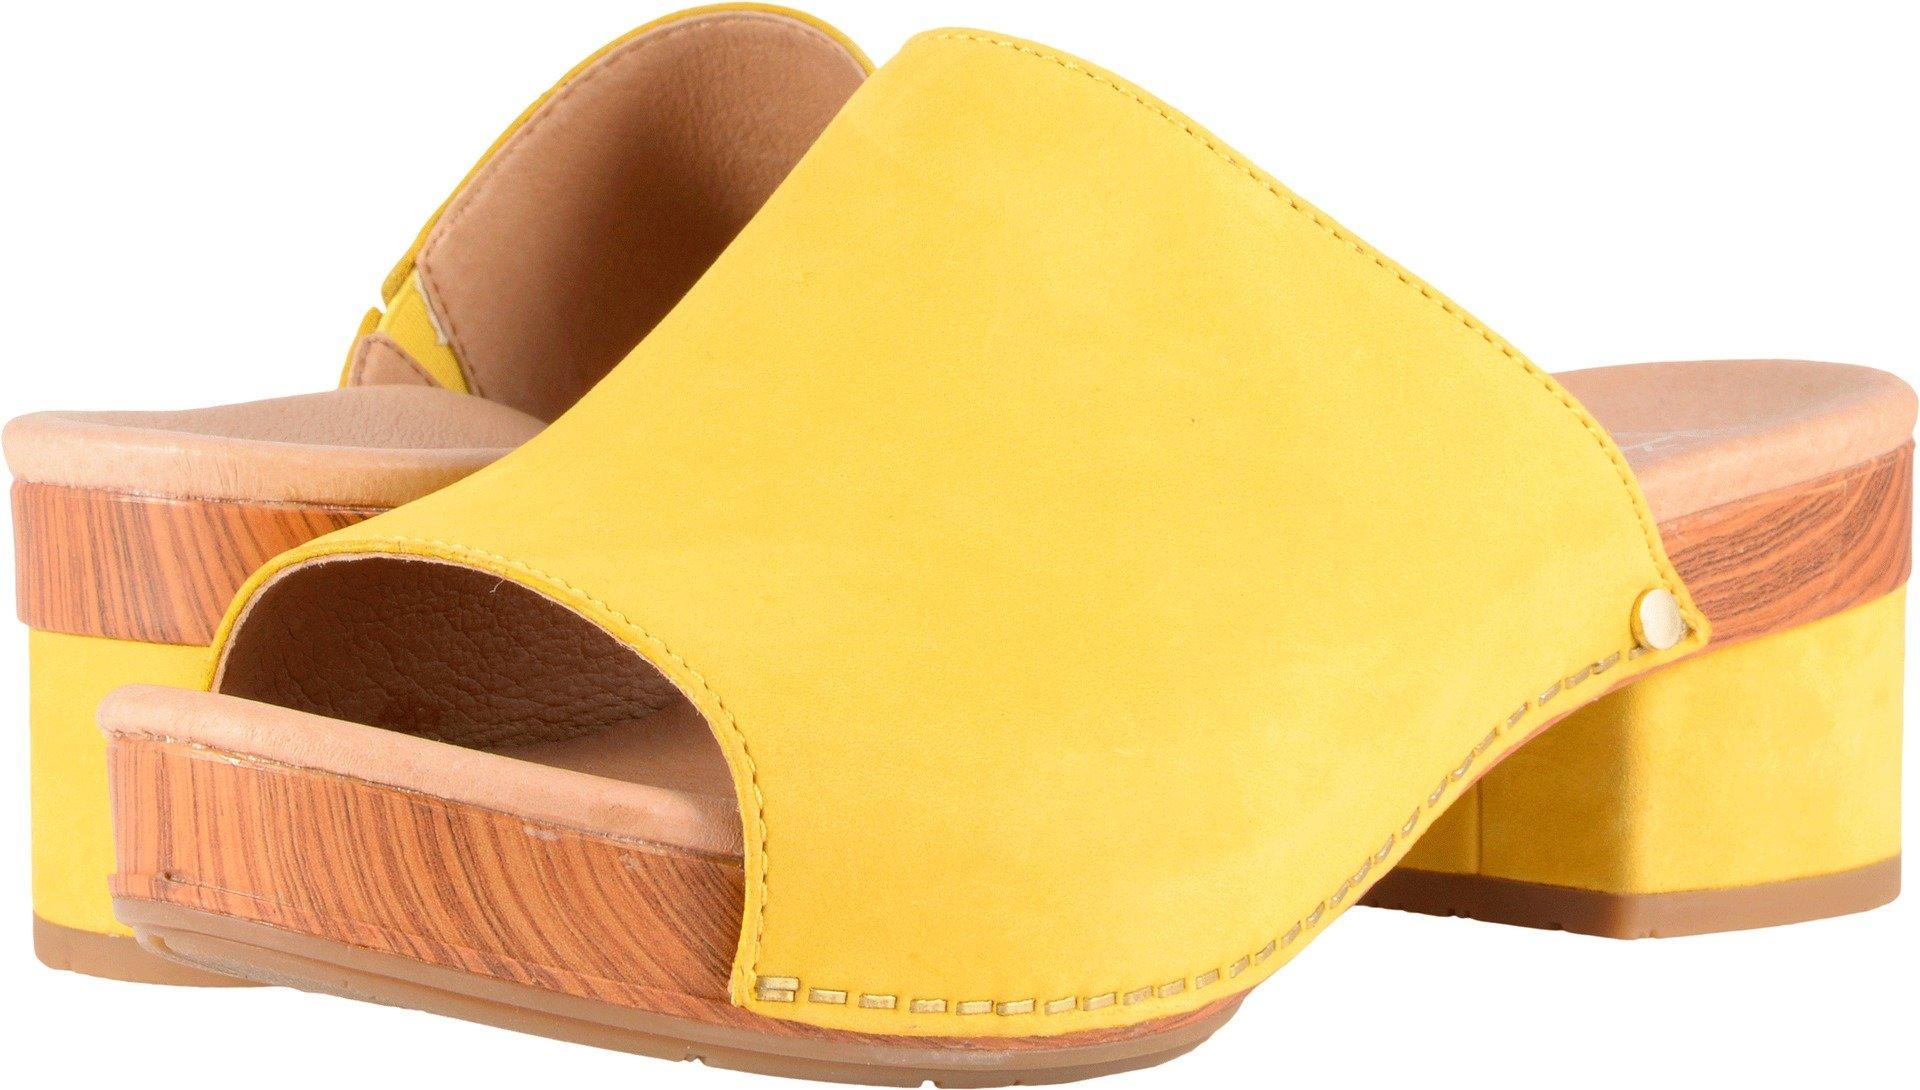 Dansko Women's Maci Sandal Yellow Milled Nubuck Size 39 EU (8.5-9 M US Women)